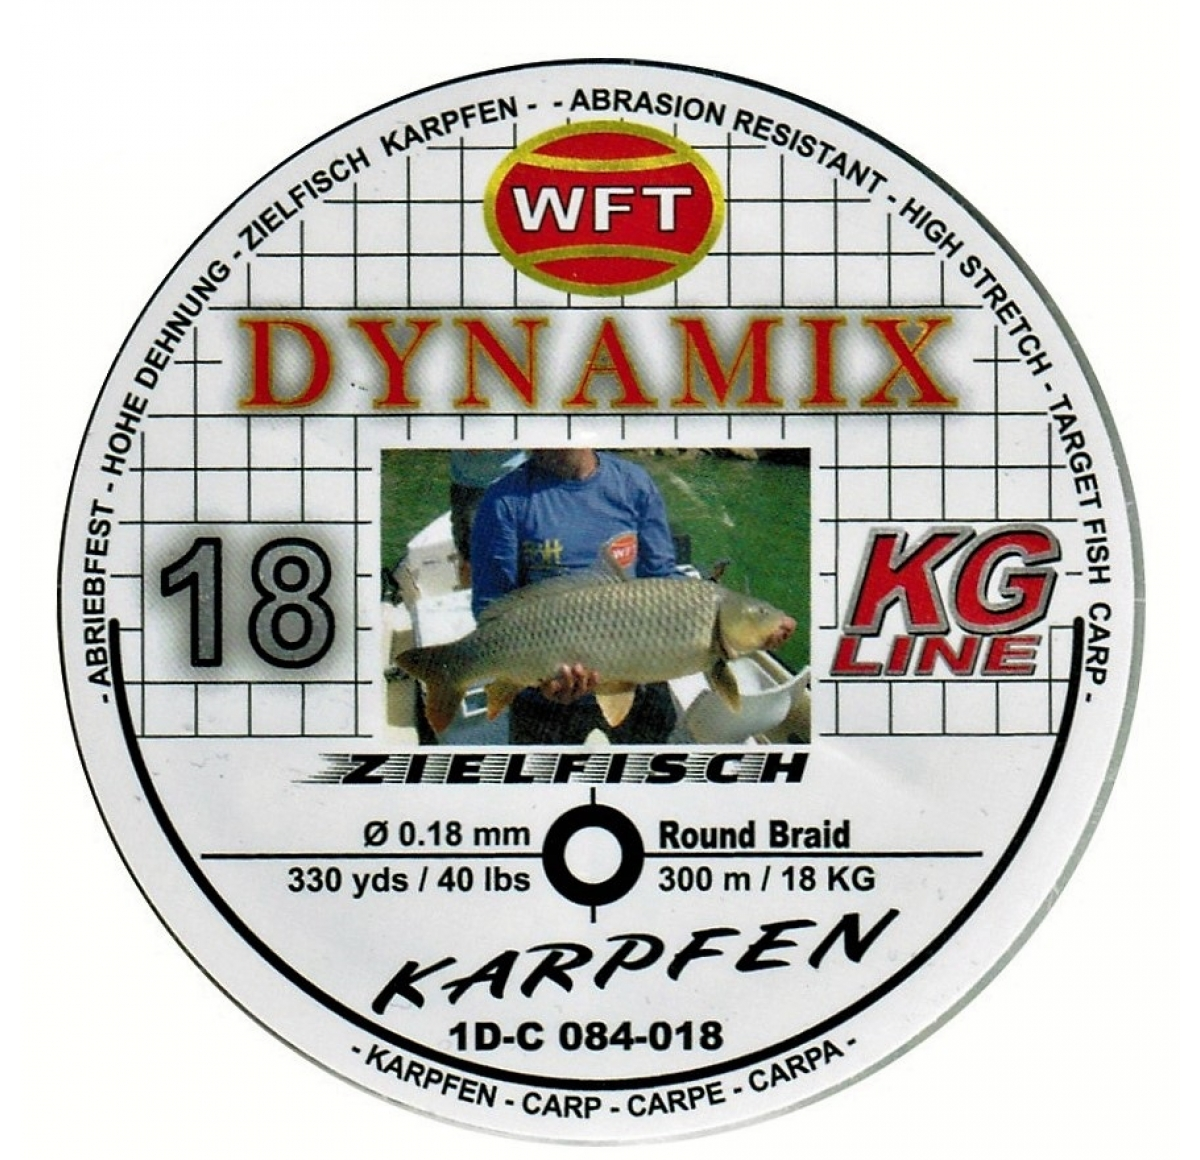 WFT Dynamix Karpfen black 300m15KG